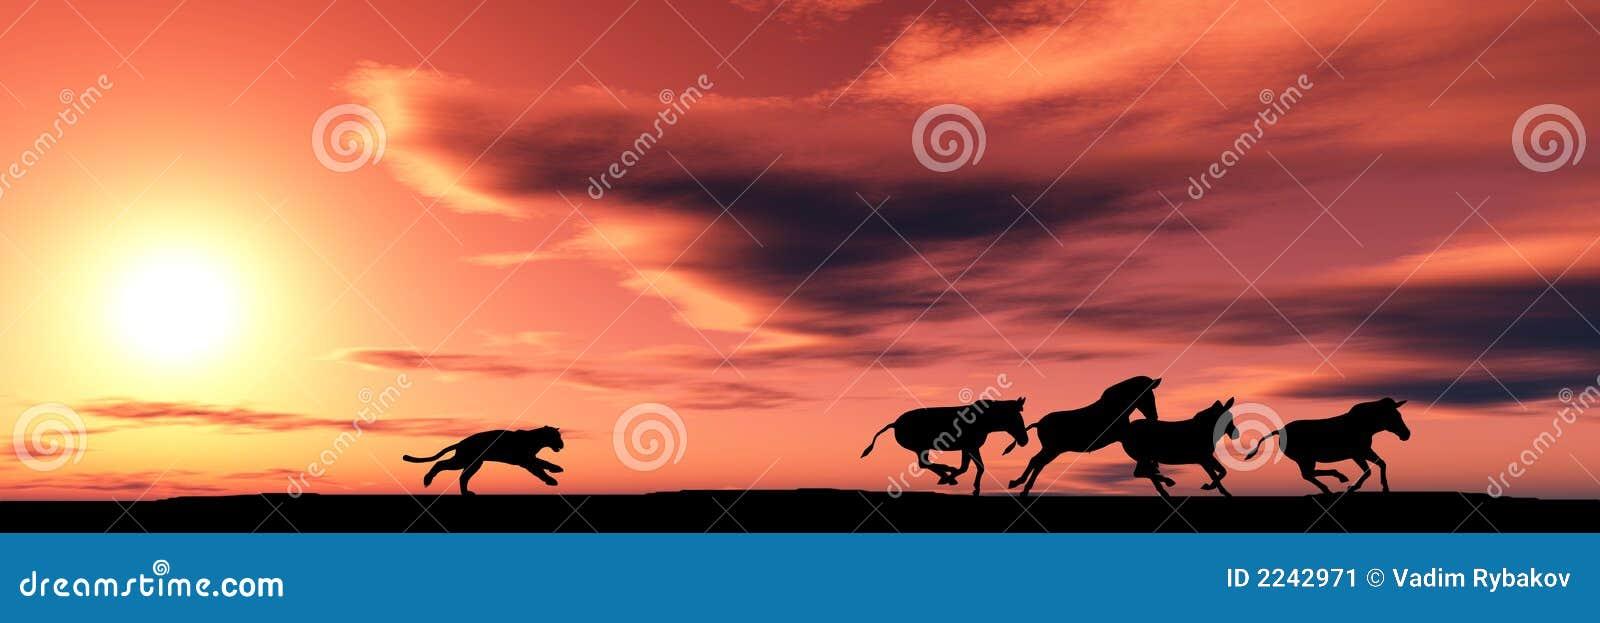 Cougar polowania